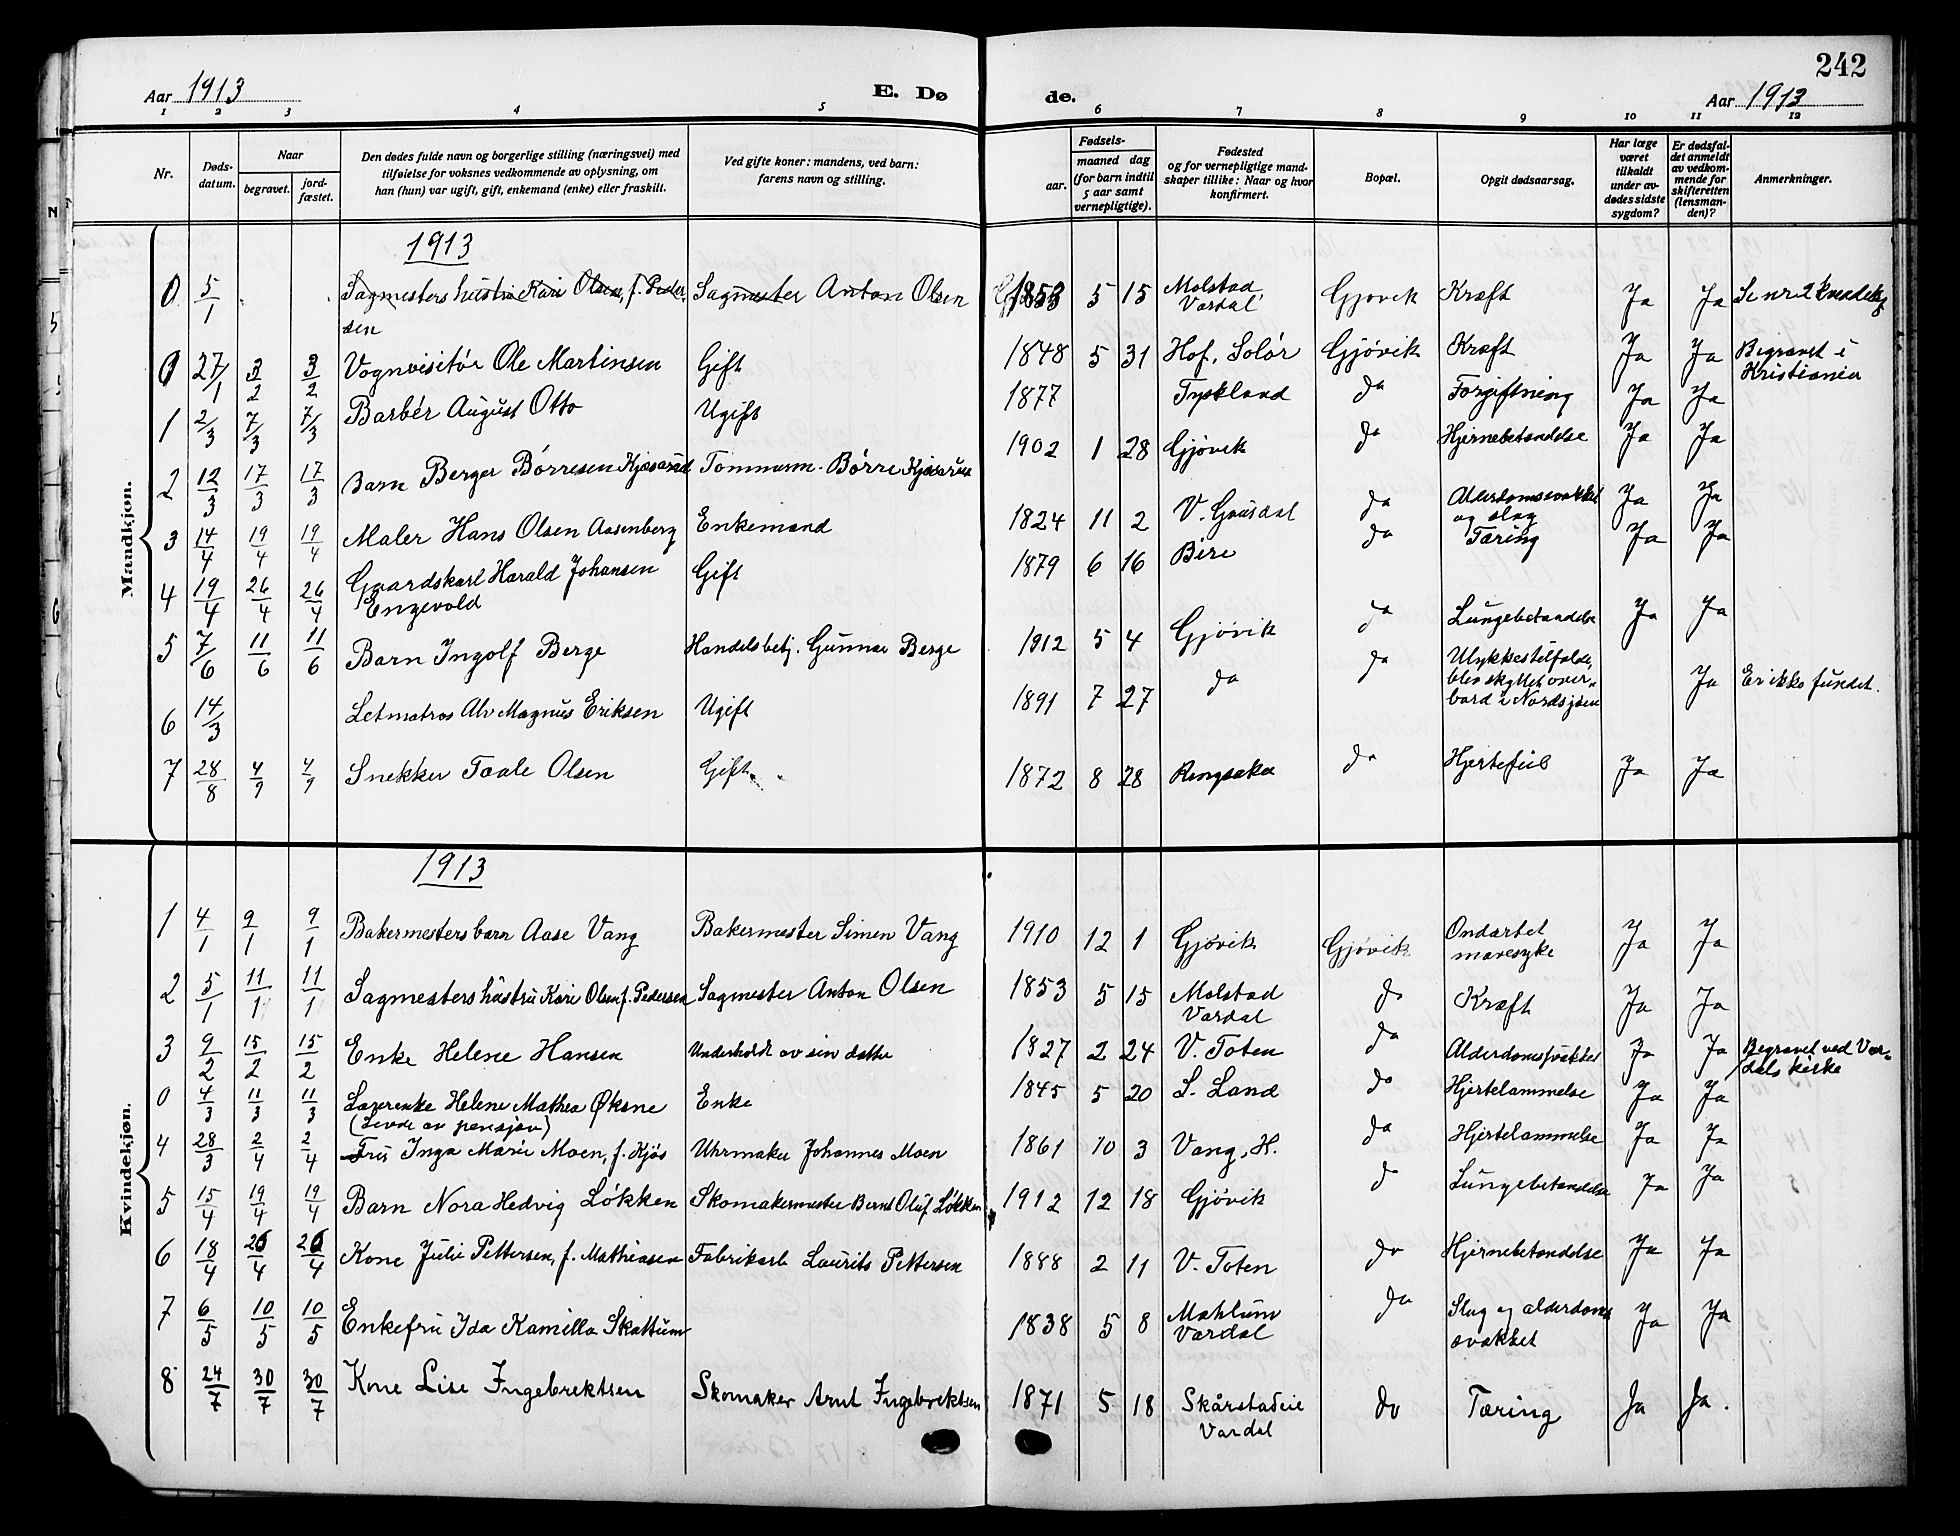 SAH, Vardal prestekontor, H/Ha/Hab/L0014: Klokkerbok nr. 14, 1911-1922, s. 242